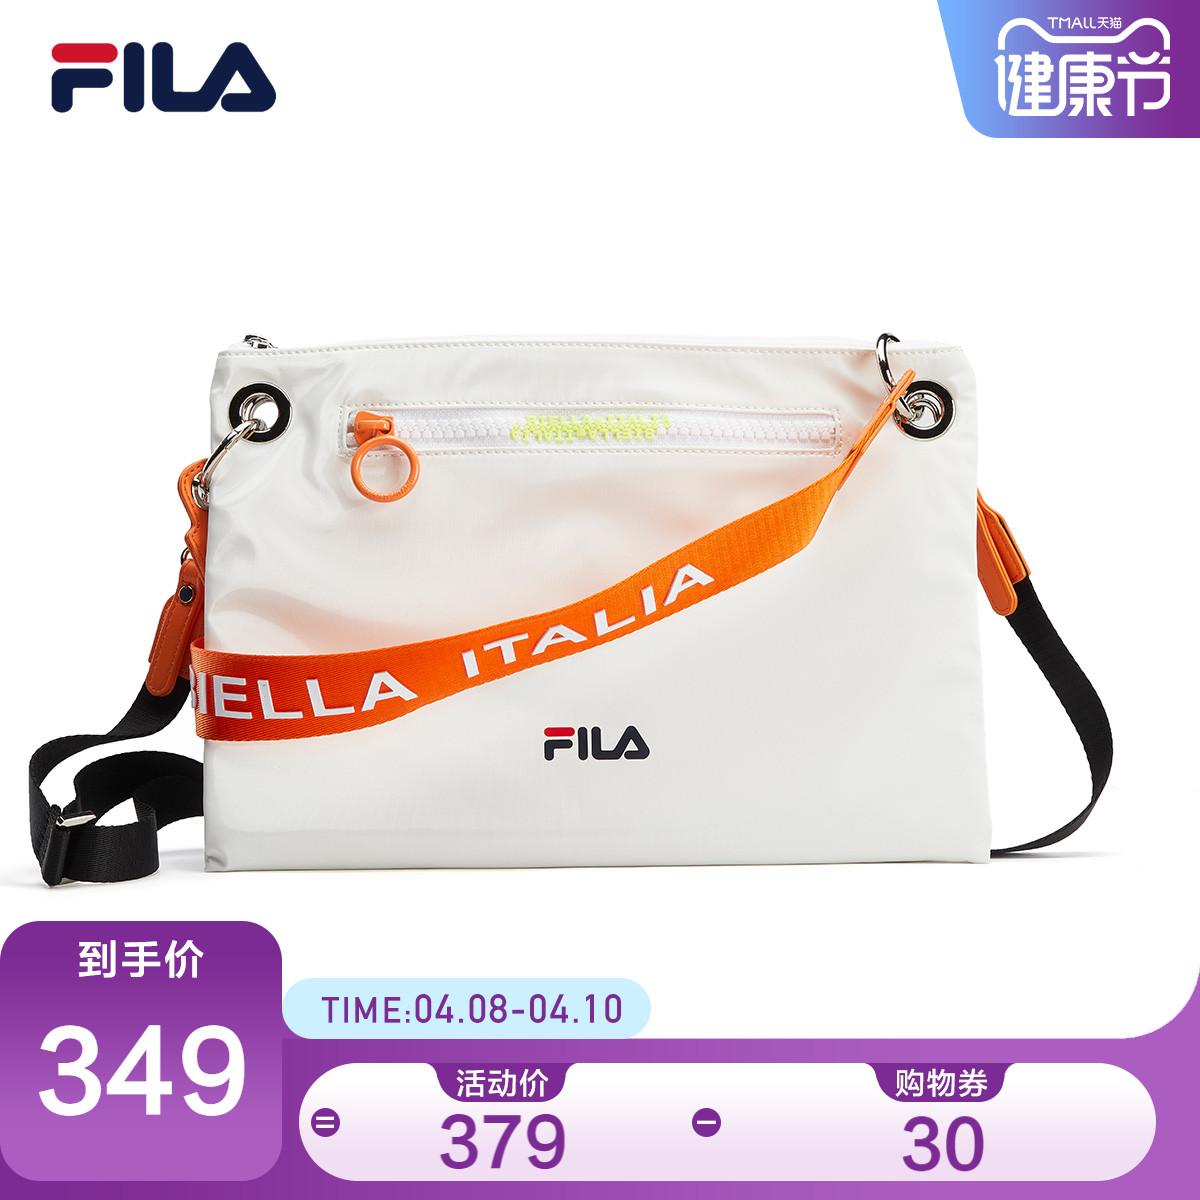 FILA Philae official womens bag 2021 spring new fashion casual one-shoulder bag girl